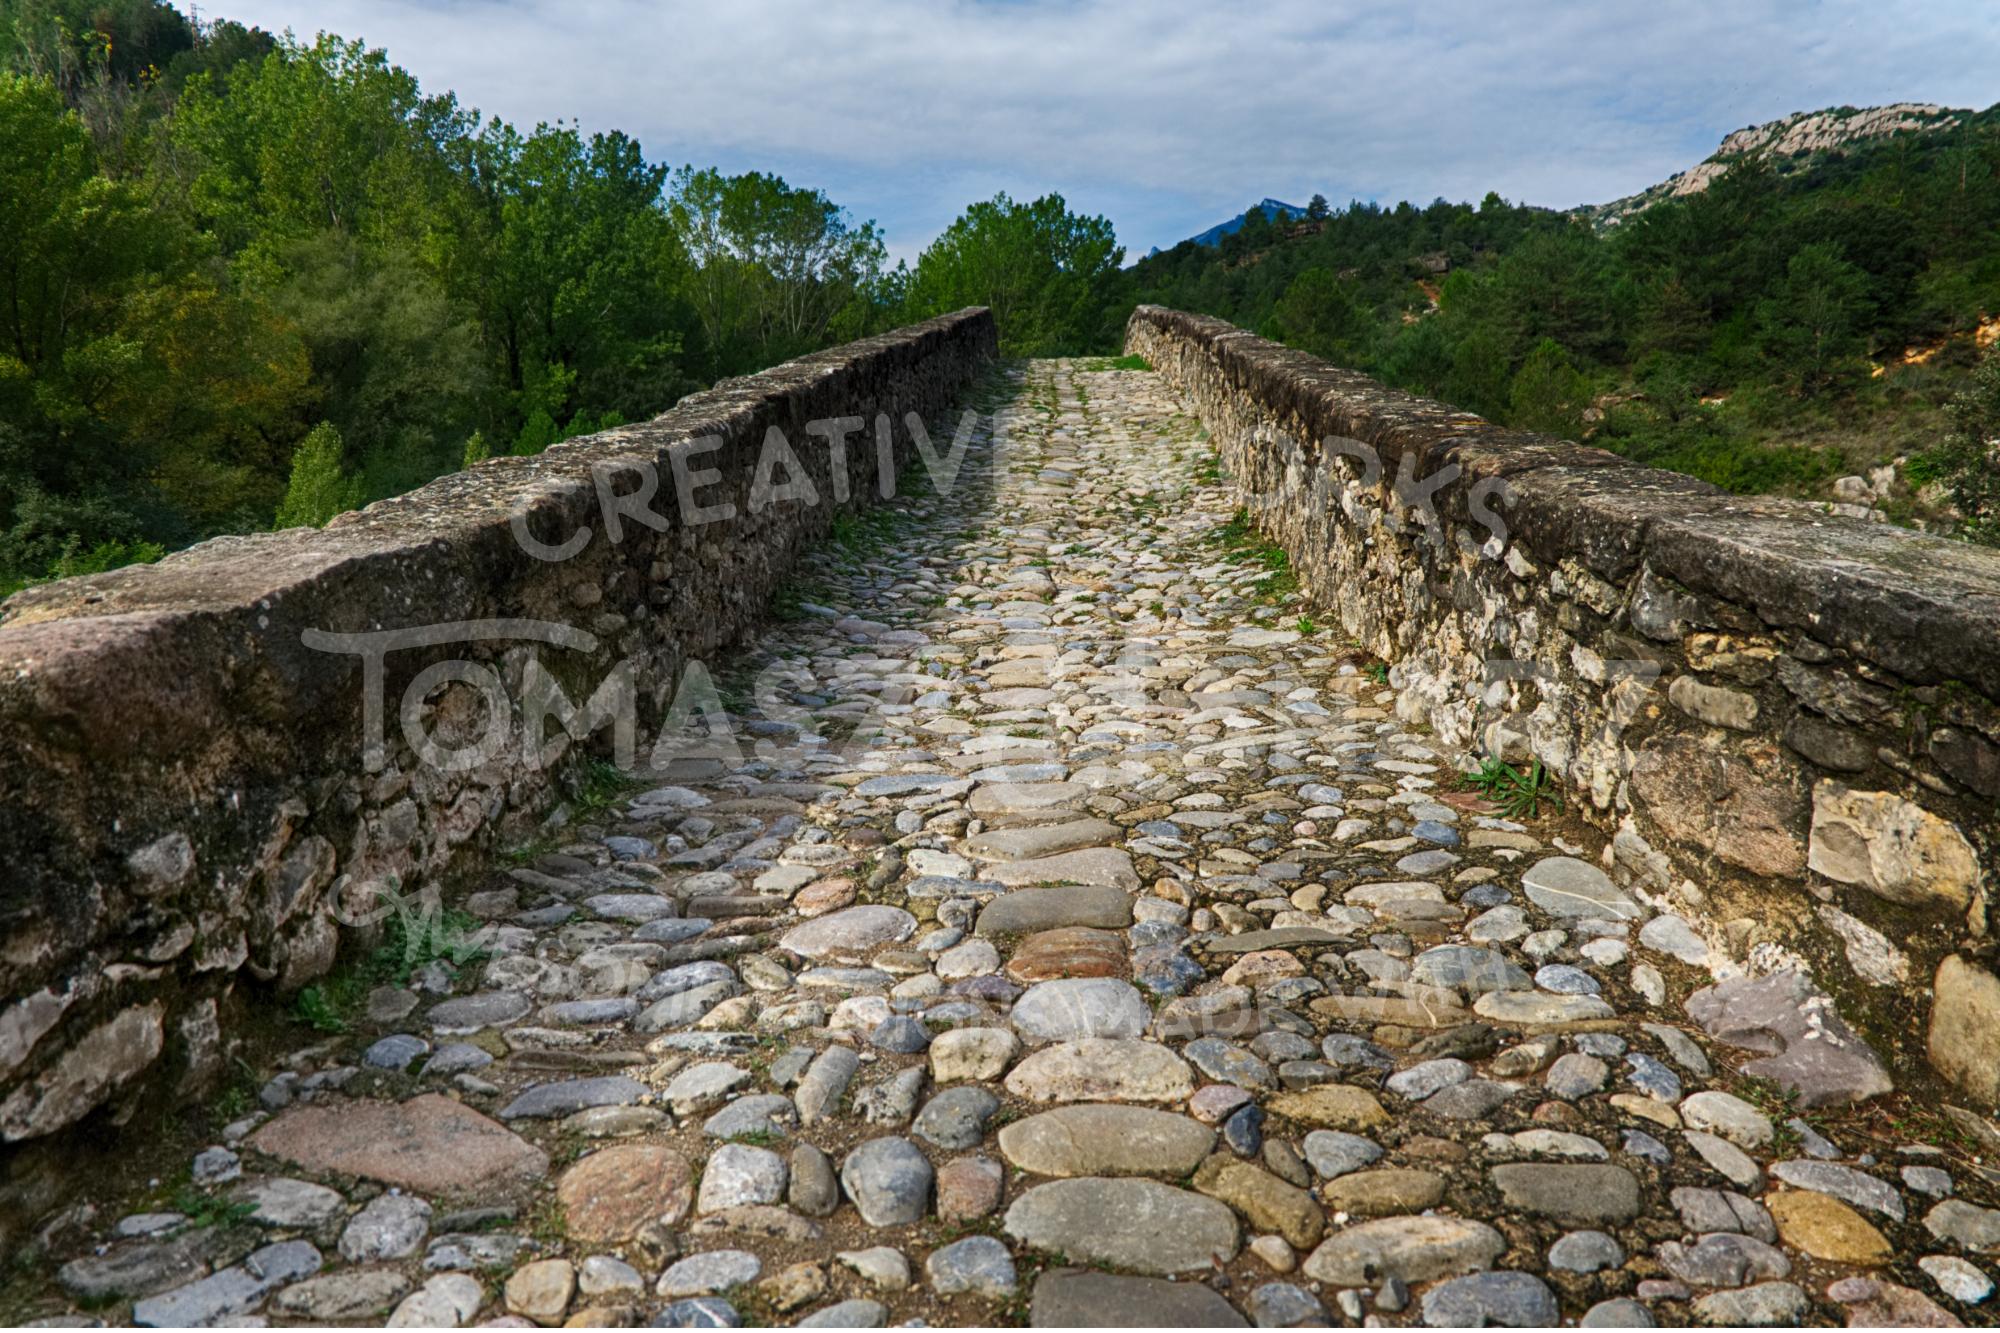 Gothic Stone Bridge Over The River Llobregat 4 example image 1